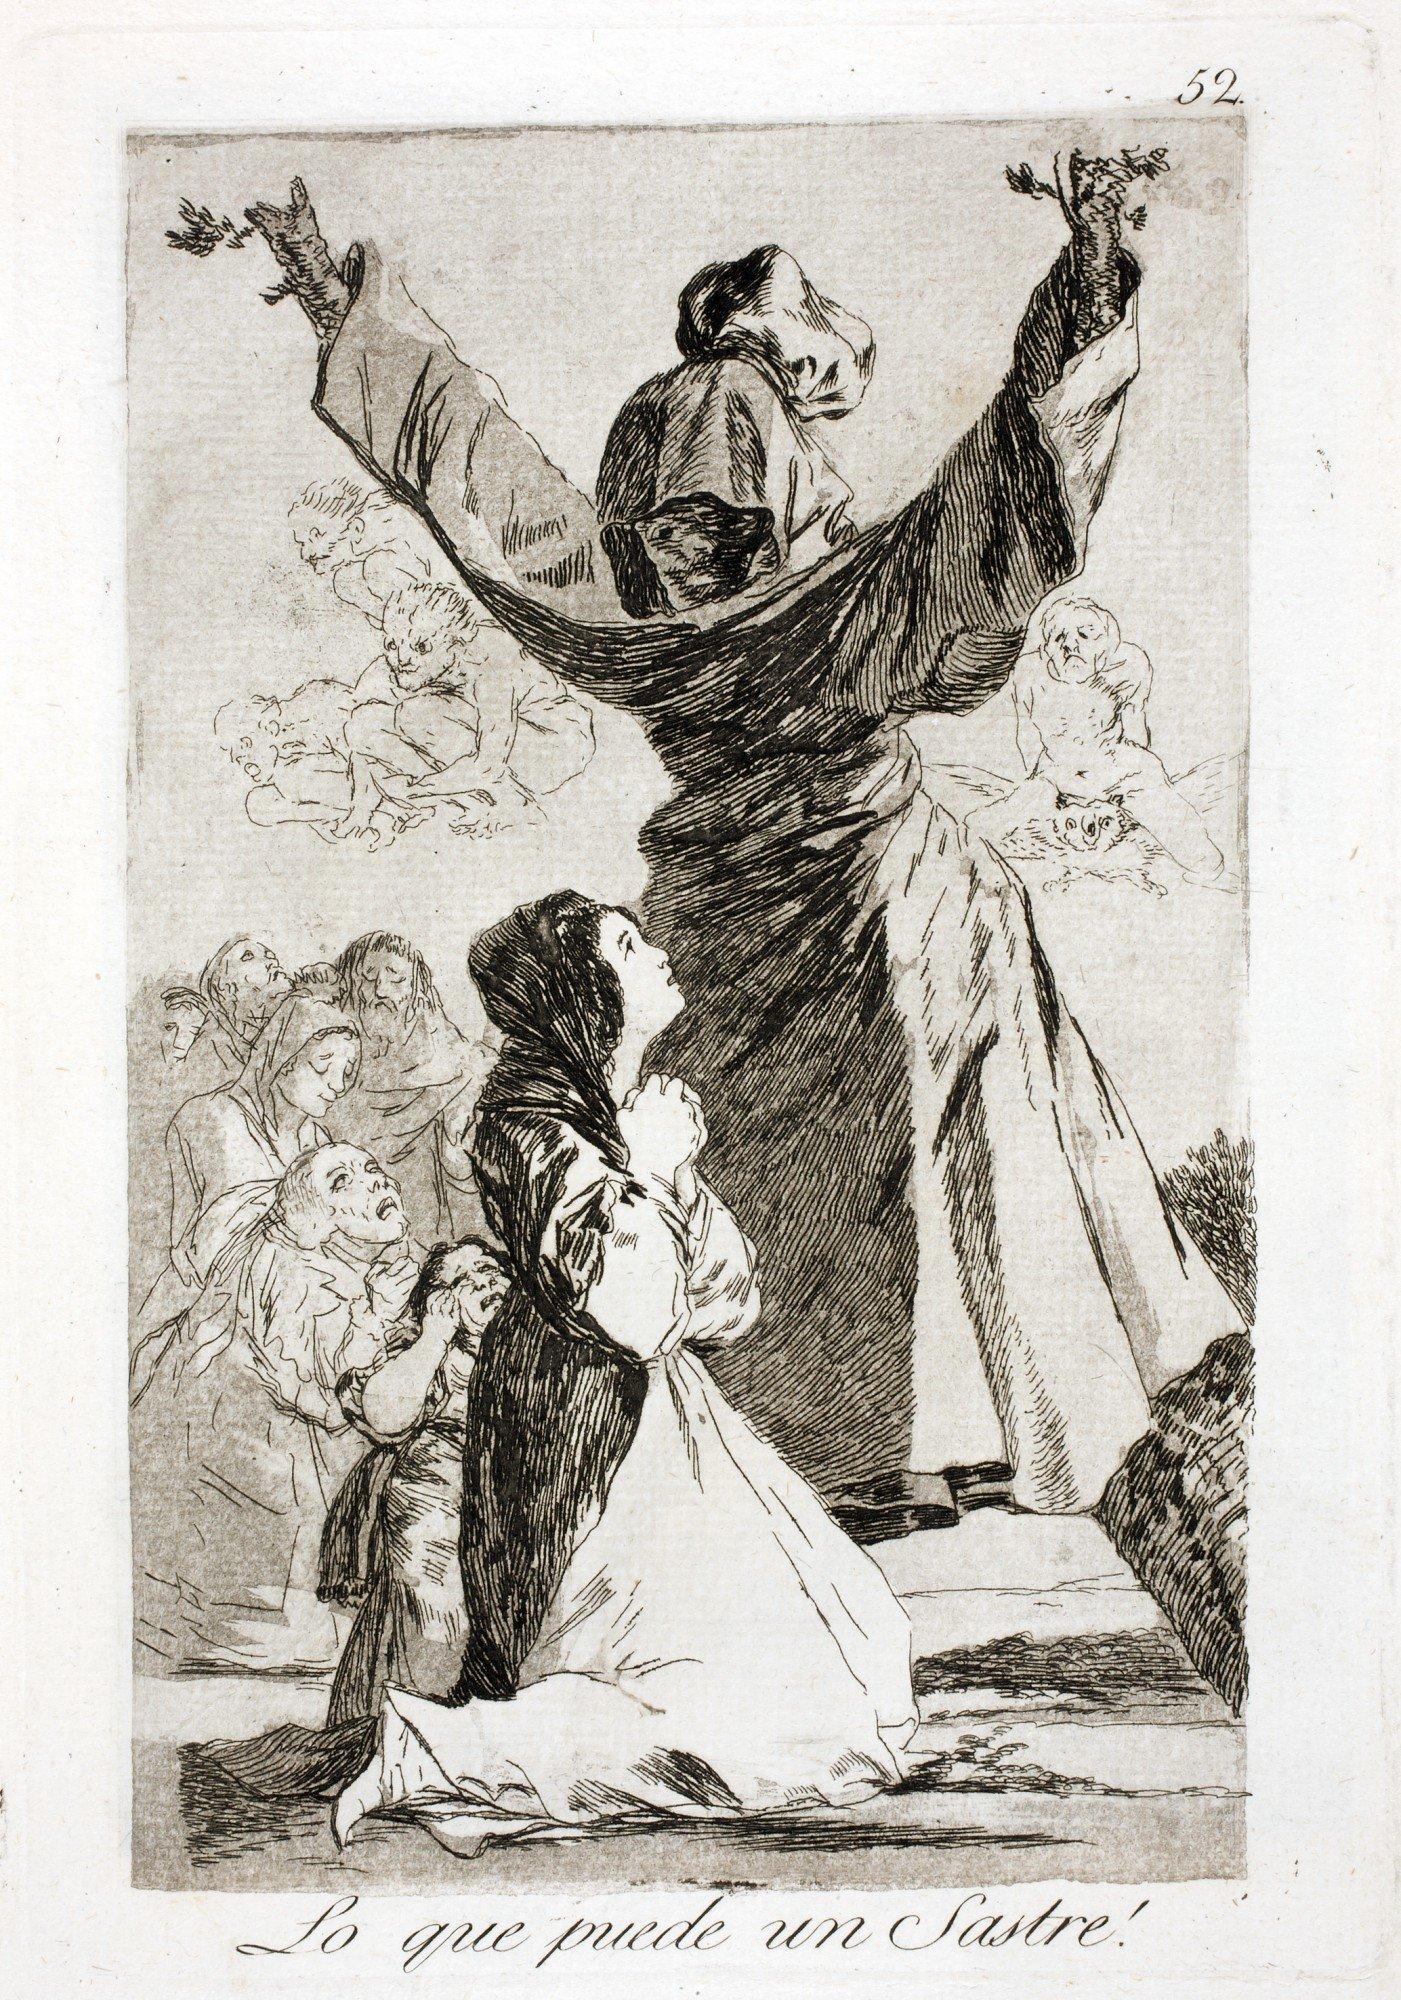 Os 80 caprichos de Goya mostram-se em Portugal – Observador